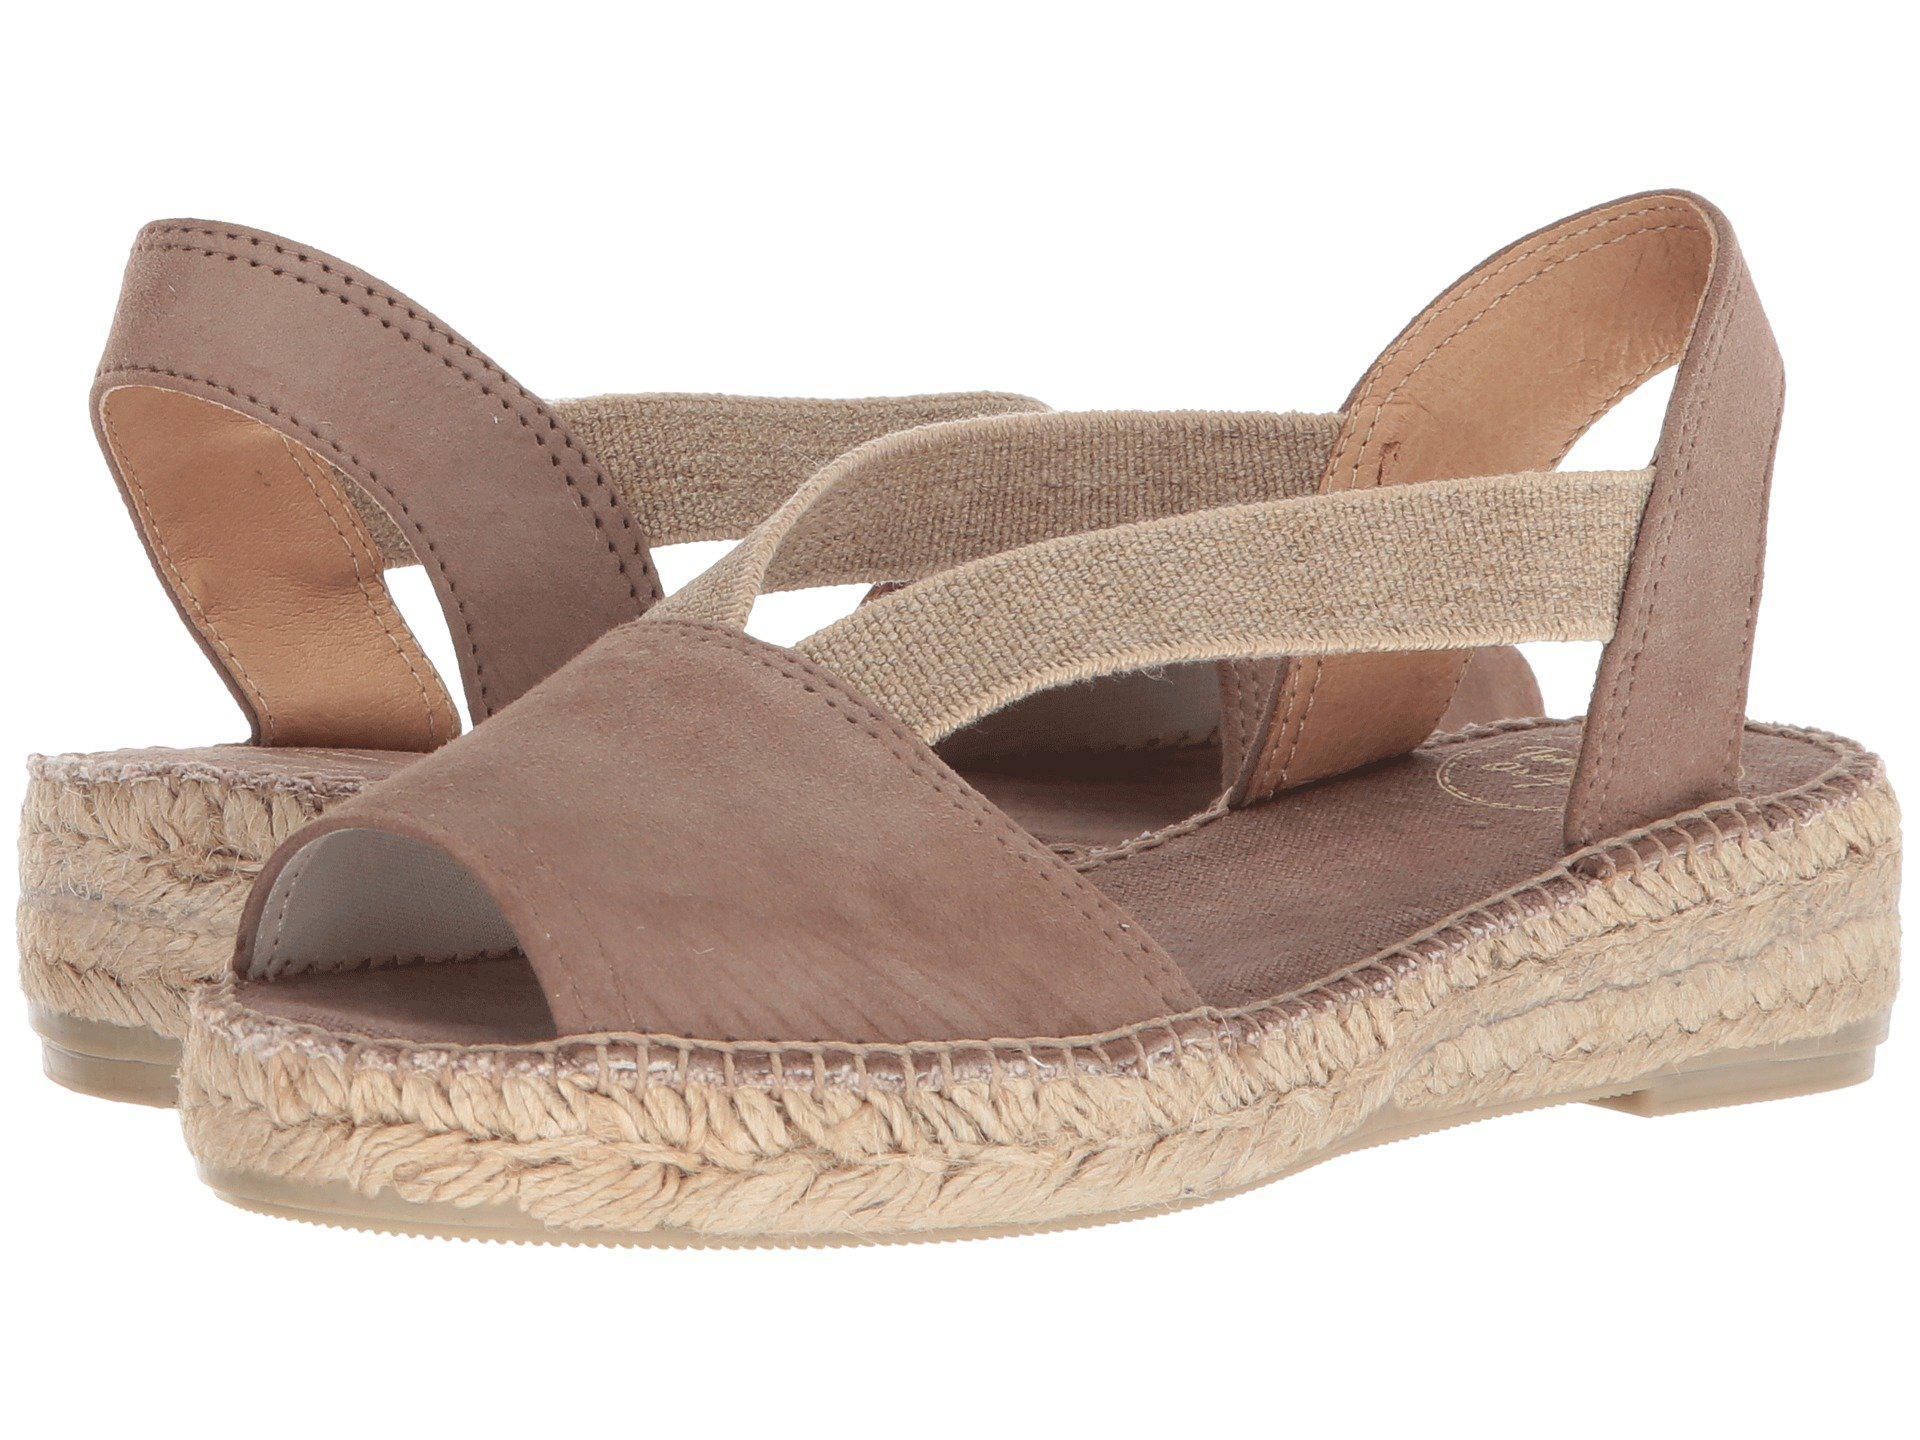 cb6432e41b152 Lyst - Toni Pons Ella (black Suede) Women s Shoes